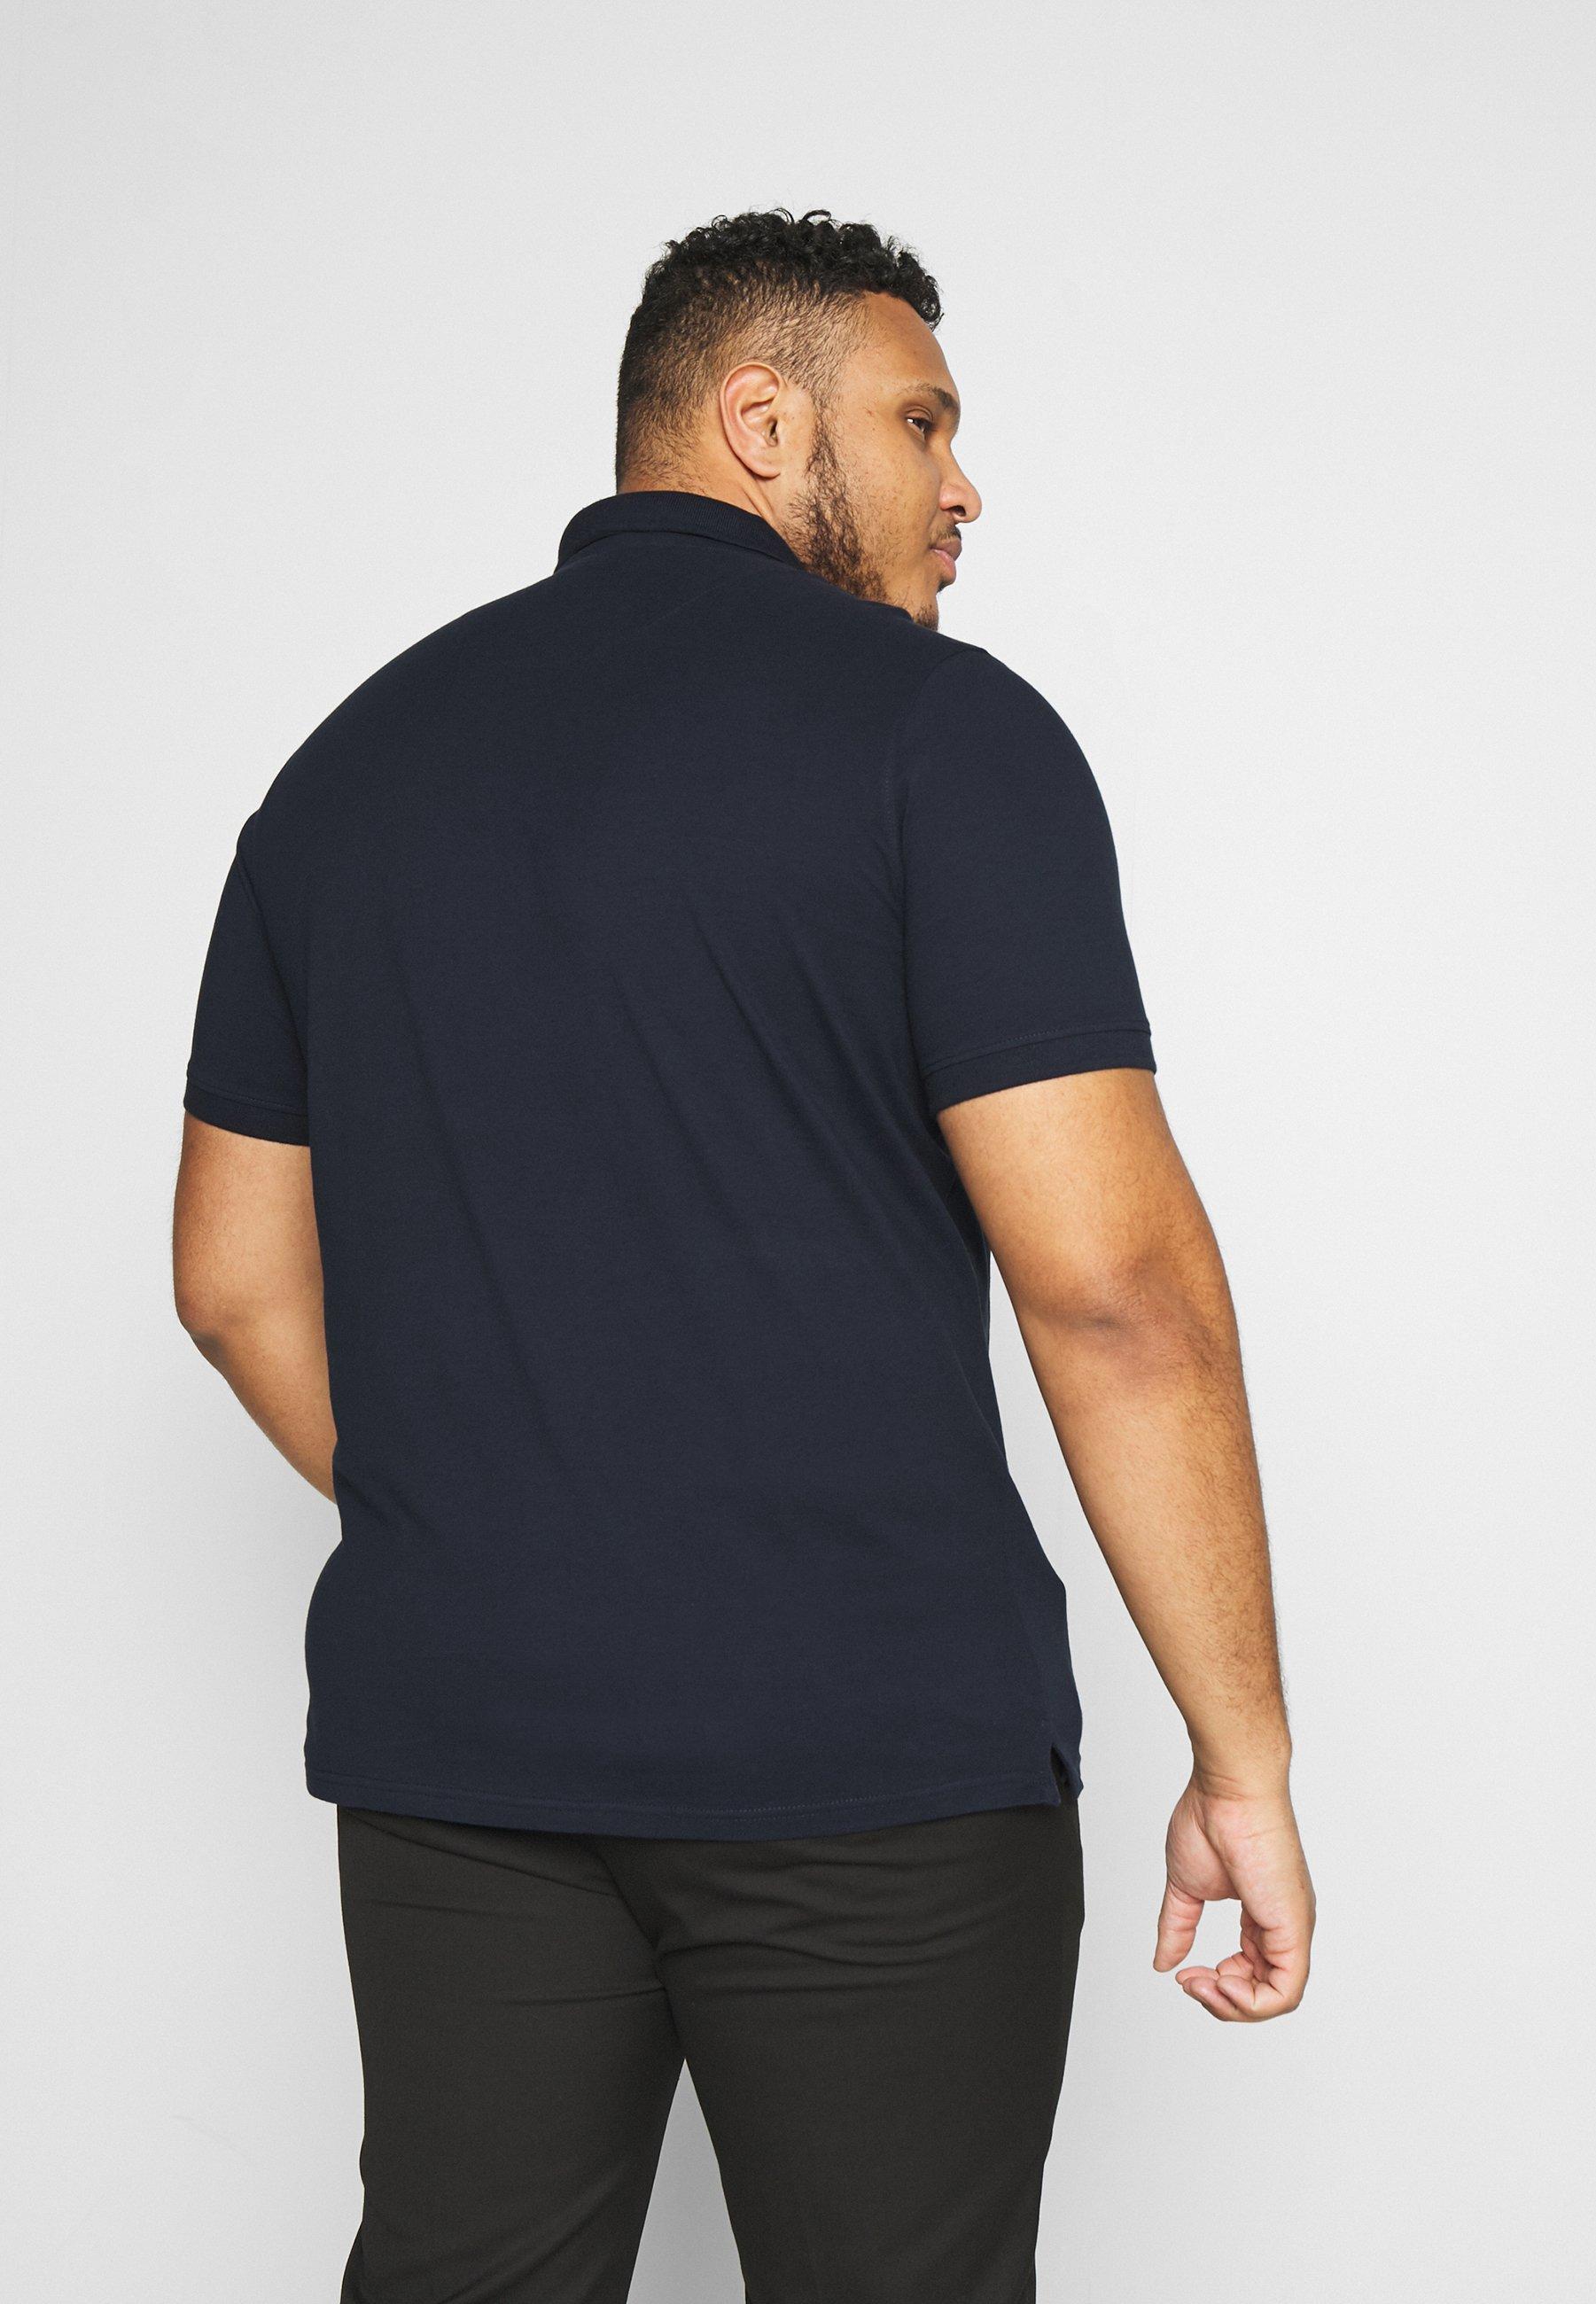 Pier One Polo shirt - dress blue/dark blu pbJiY